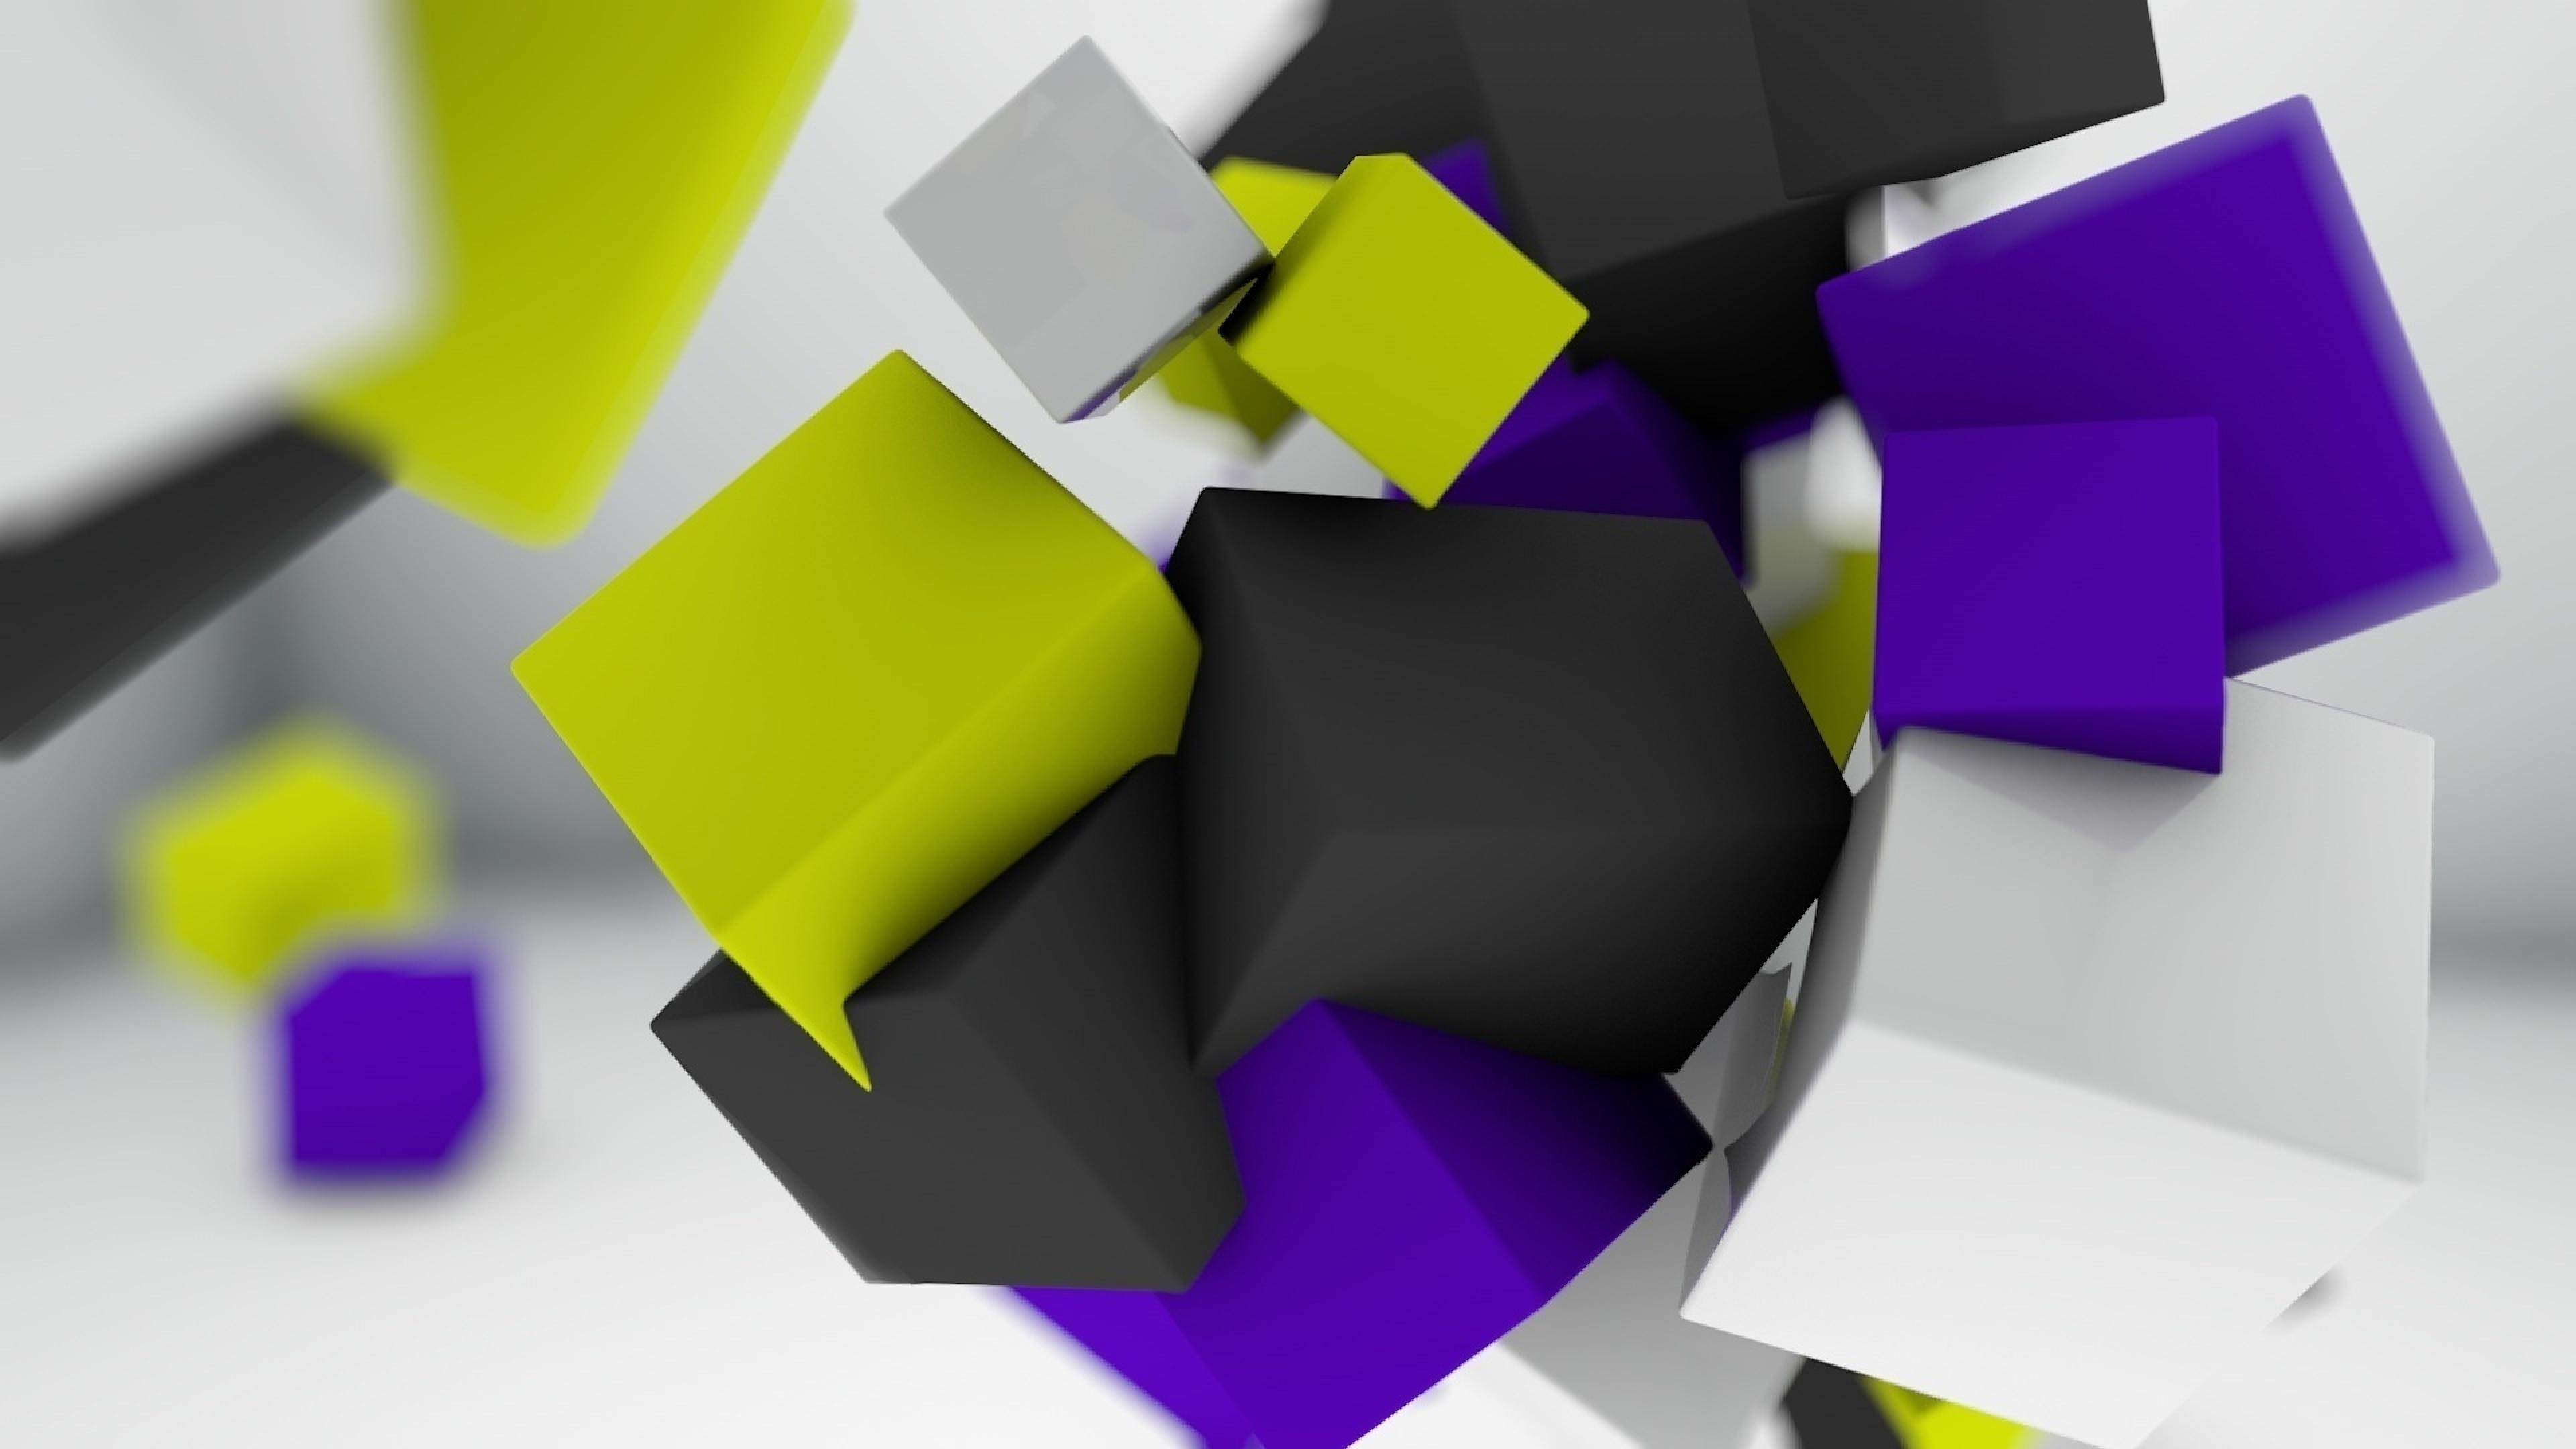 Кубики  № 2315807 бесплатно